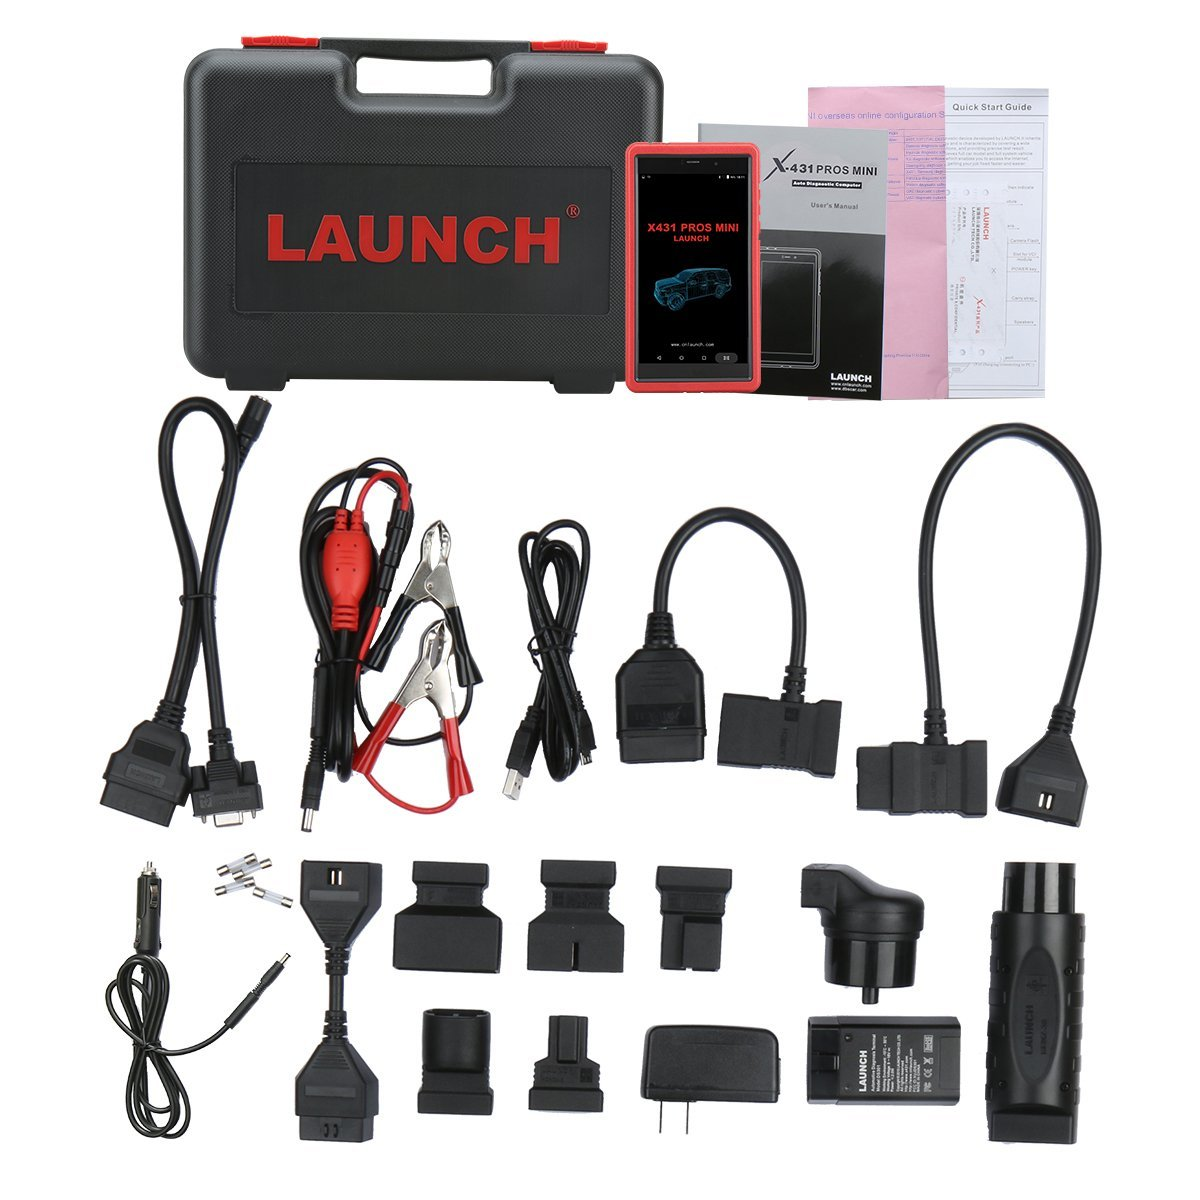 Launch X431 PROS Mini自動車診断ツール OBD2スキャナーコードリーダー Wifiとbluetooth接続+1年間無料アップデート